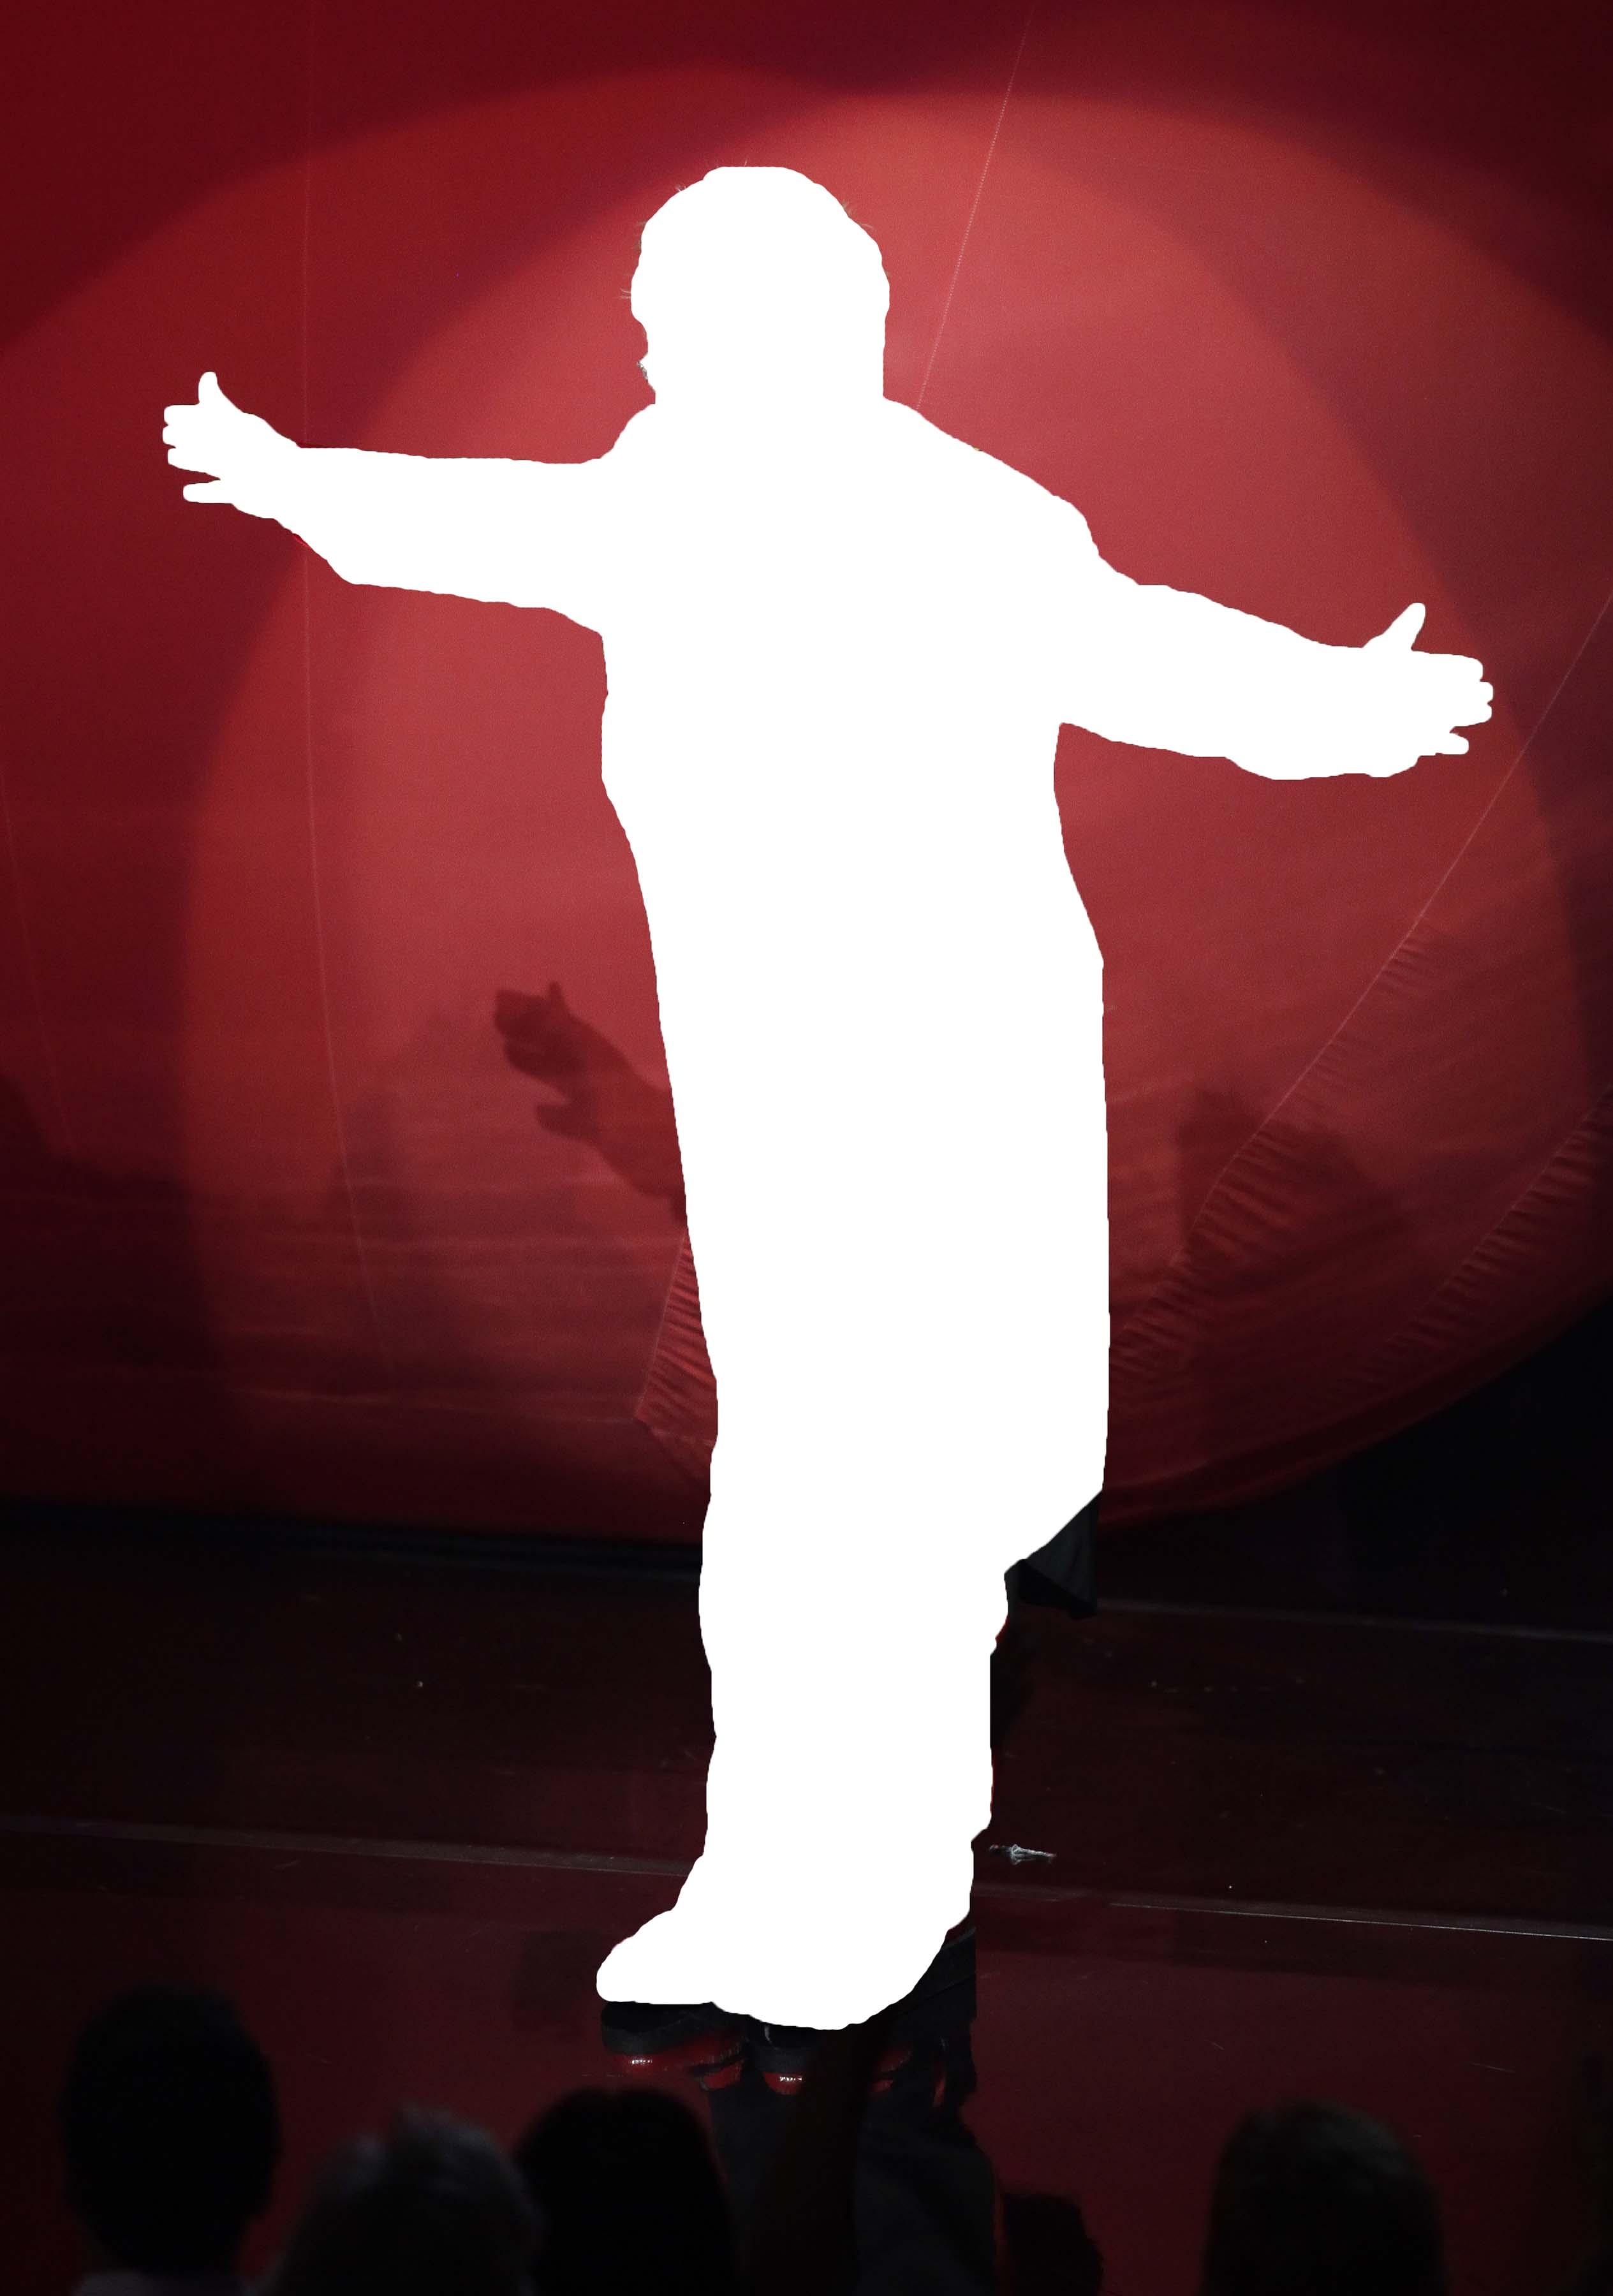 Elton John Silhouette